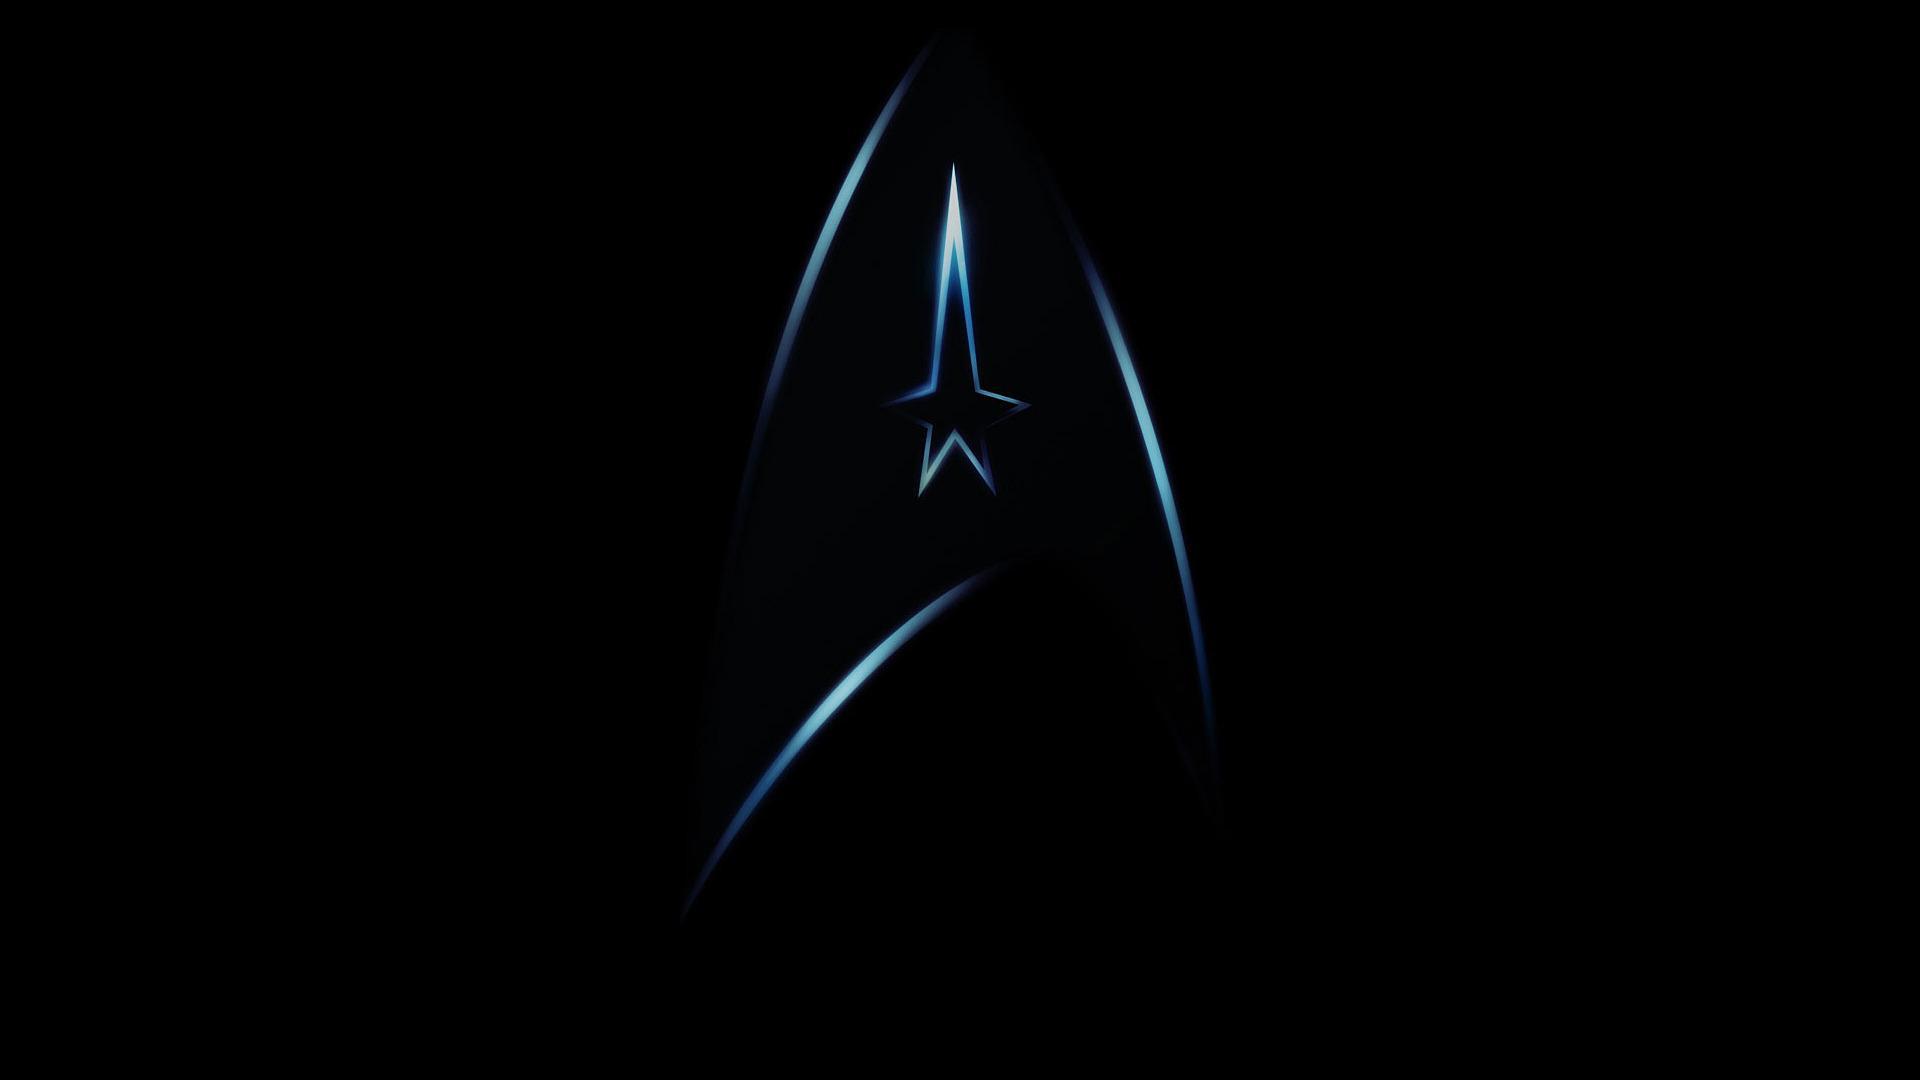 Download Star Trek Logos Wallpaper 1920x1080 Full HD Wallpapers 1920x1080